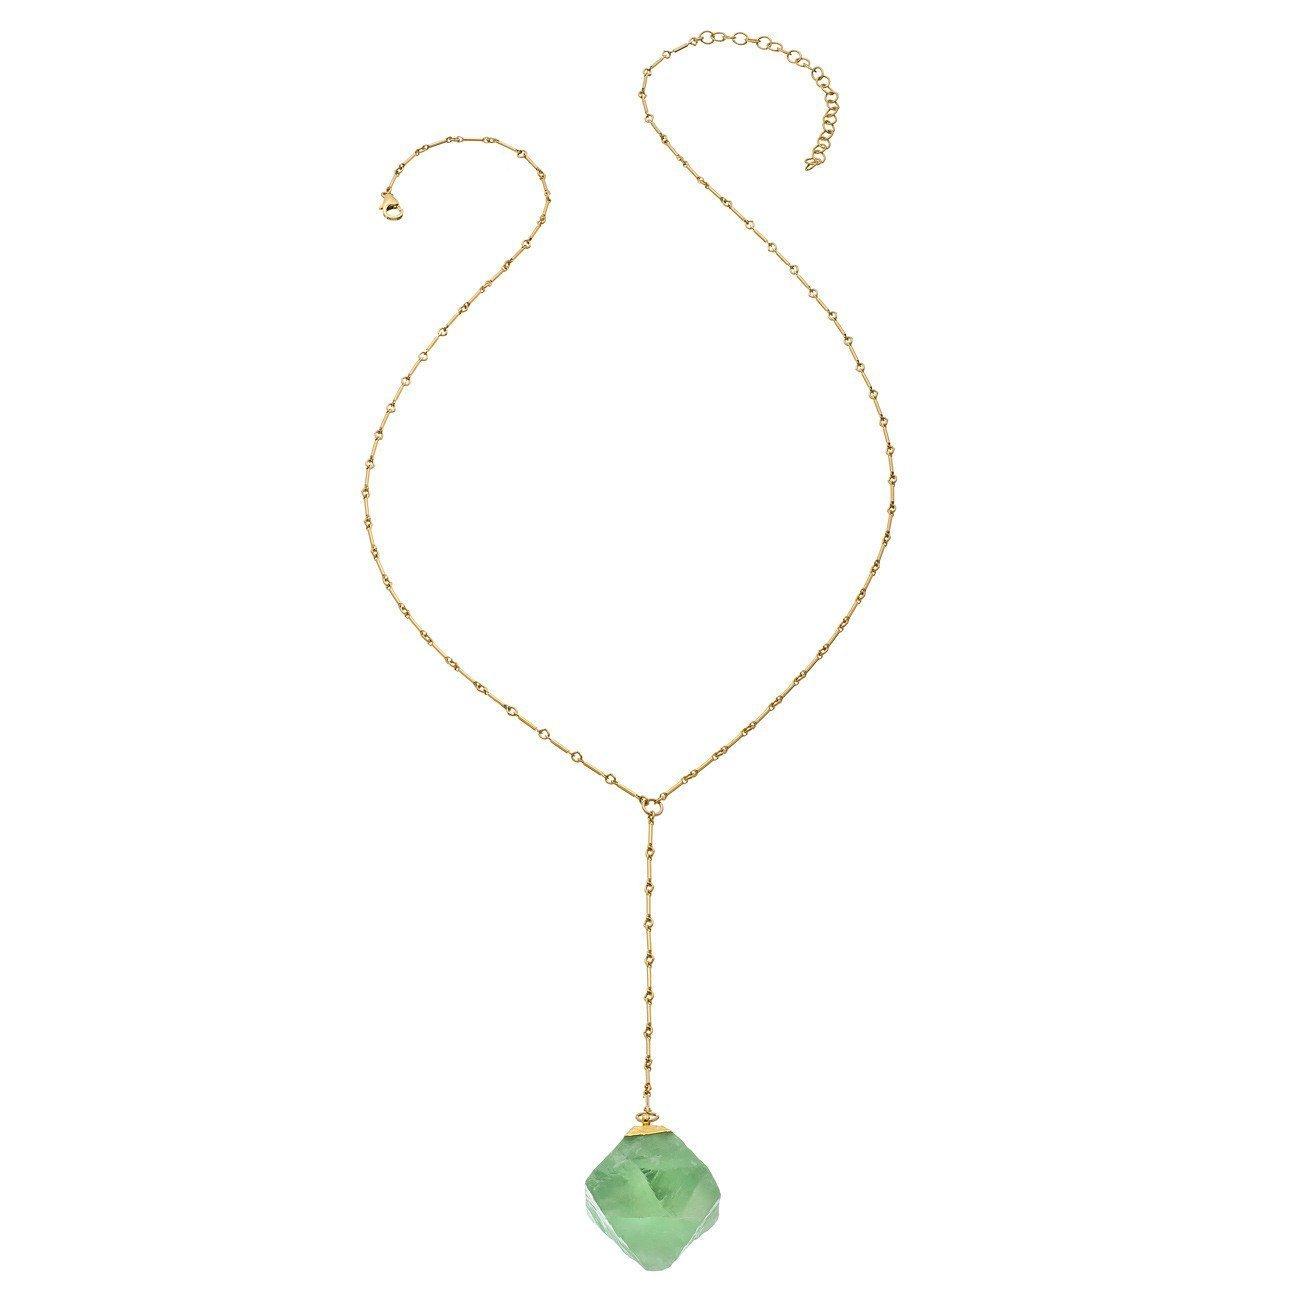 Heather Hawkins - Bar Chain Y Necklace - Fluorite Cube